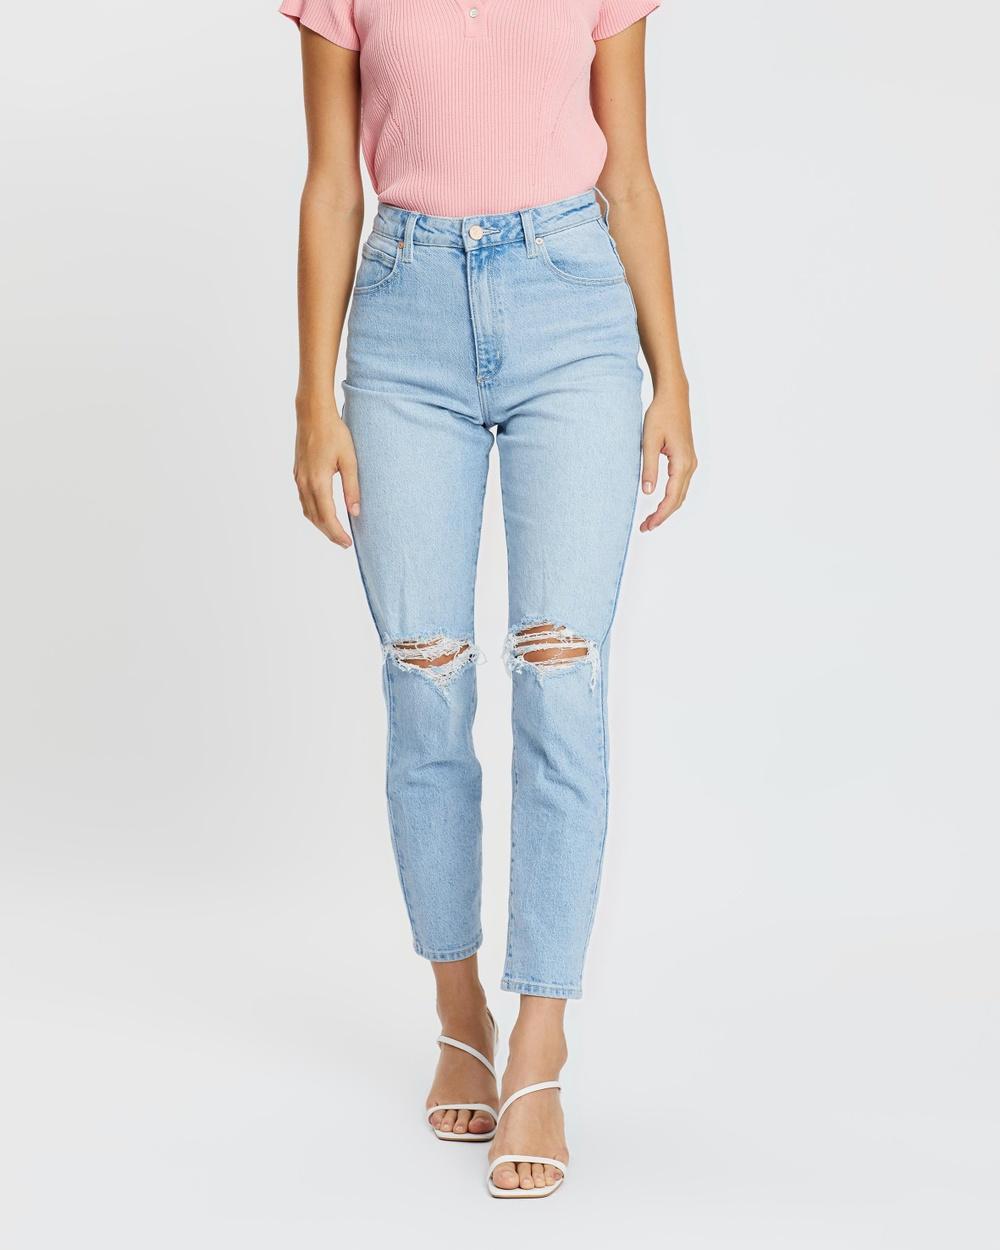 Abrand A '94 High Slim Jeans Gina Rip